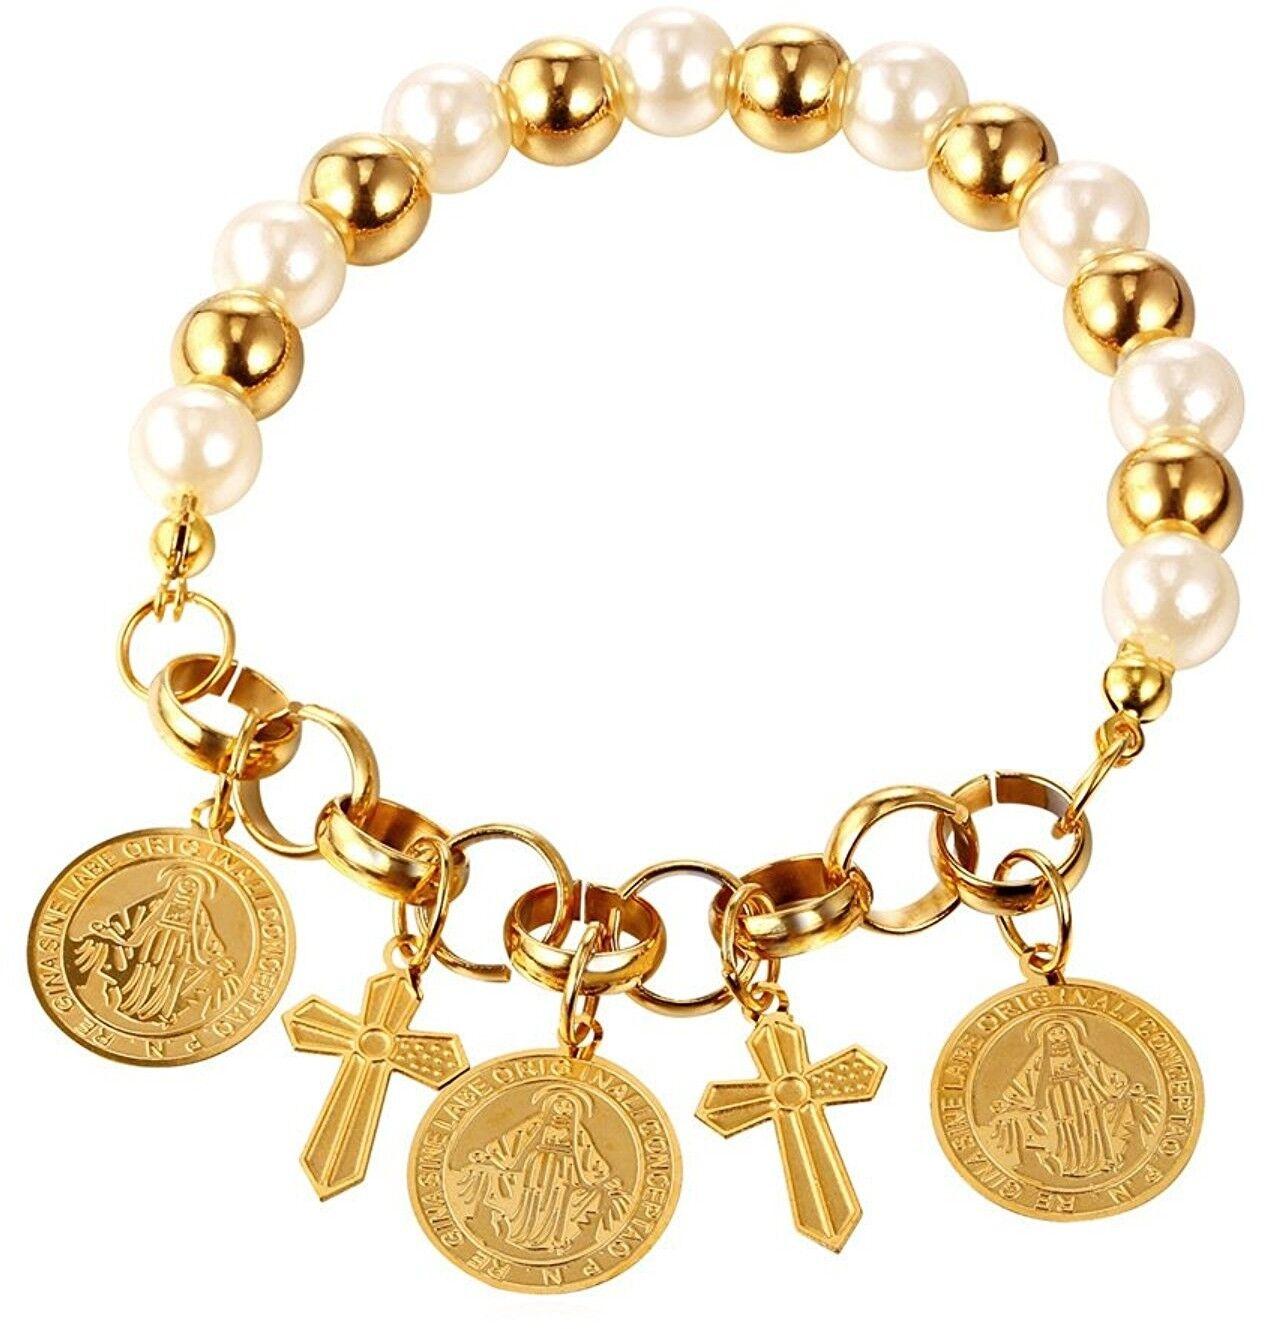 U7 Synthetic Pearl New Girls Women Gift 18K gold Plated Cross Charm Bracelet